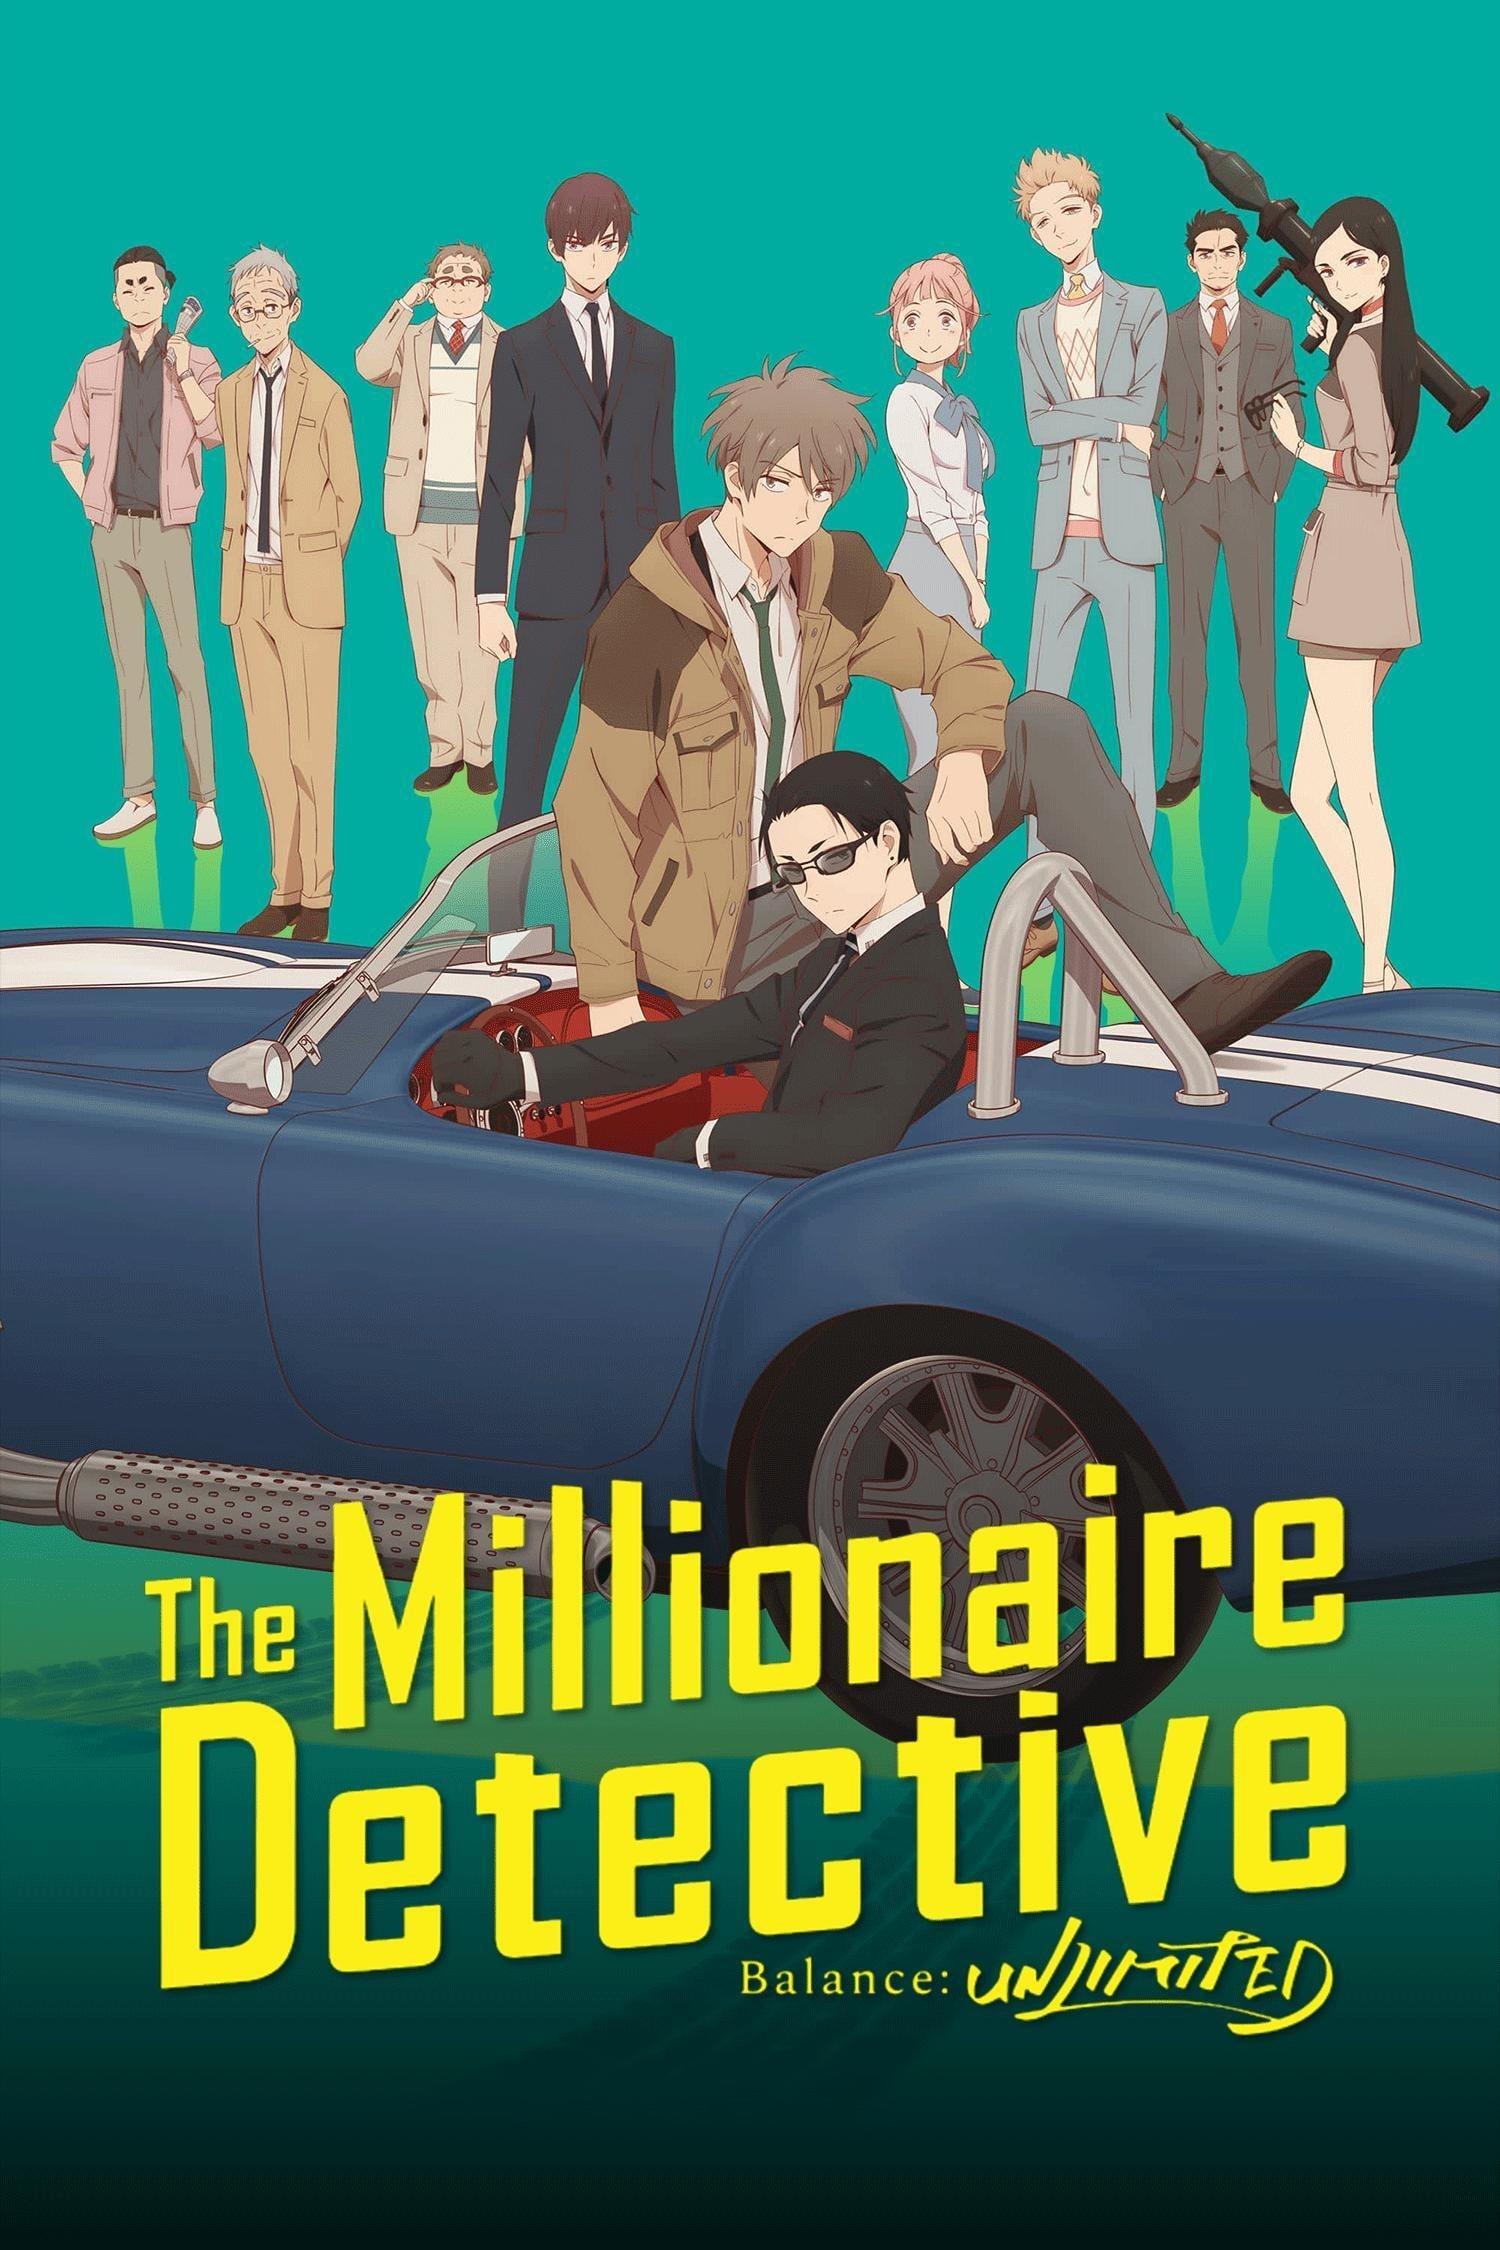 The Millionaire Detective - Balance: UNLIMITED